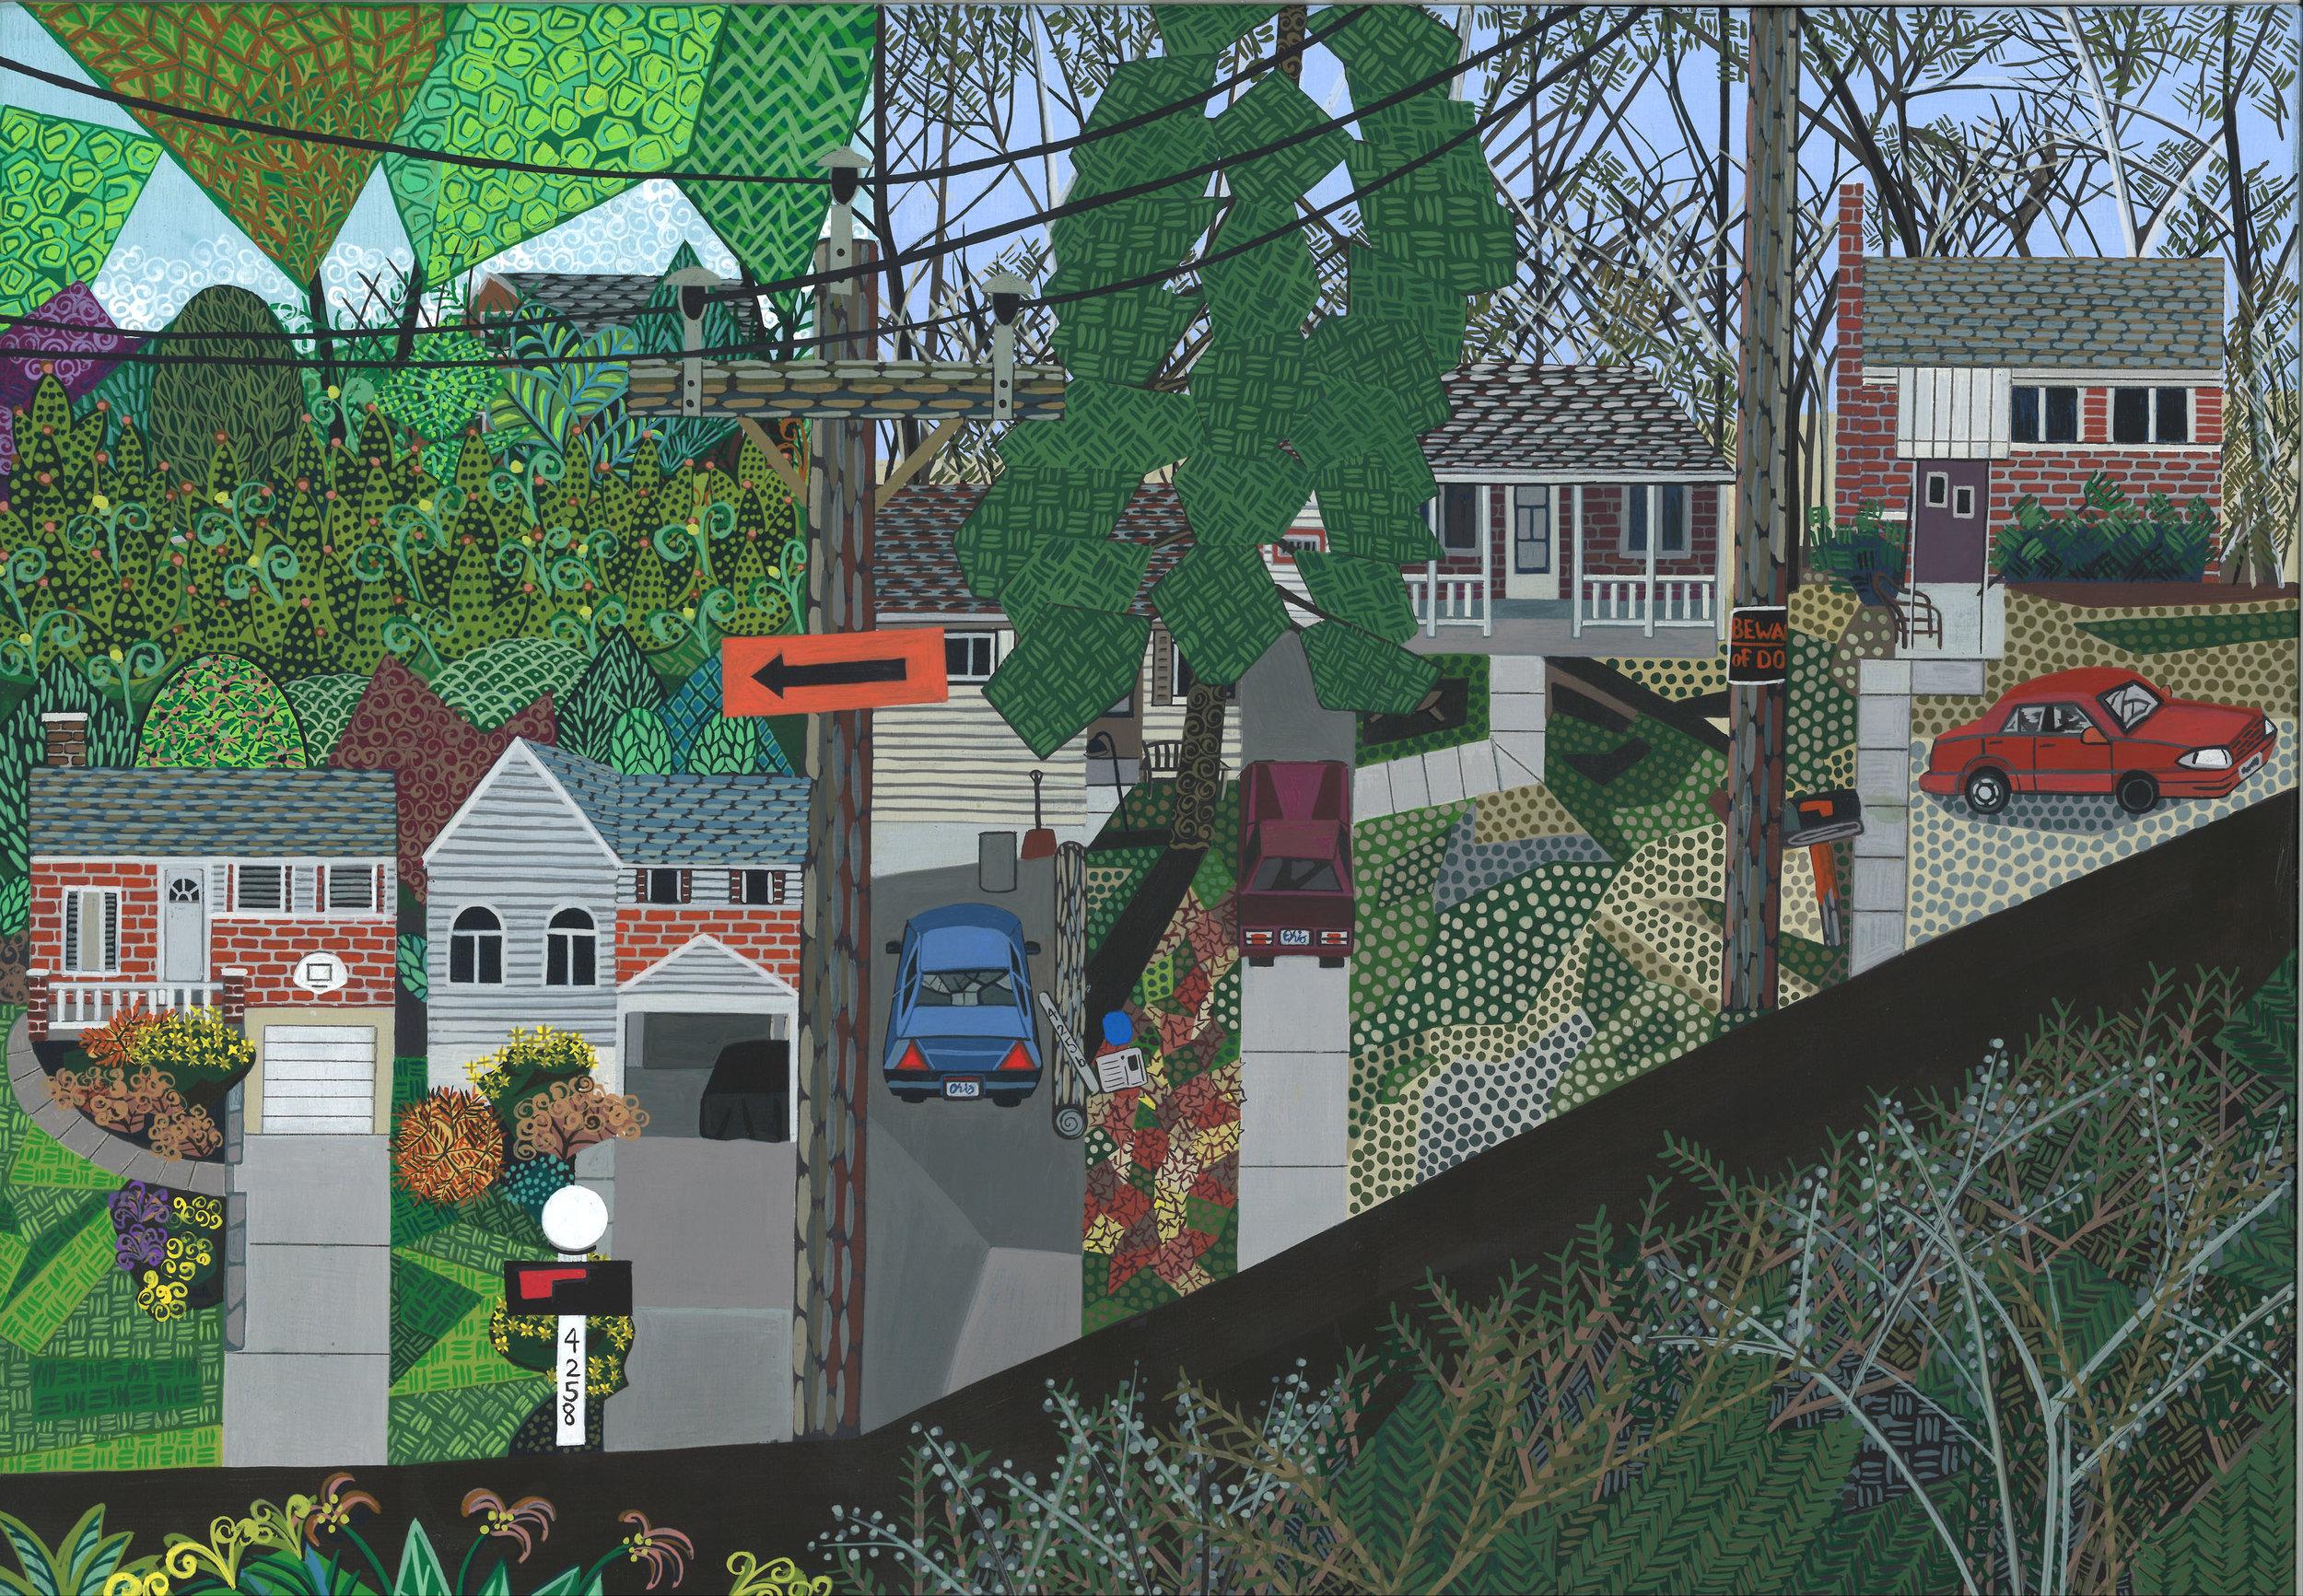 Ann Toebbe  Downhill (Delhi) , 2017 gouache and pencil on panel 12h x 16w in.